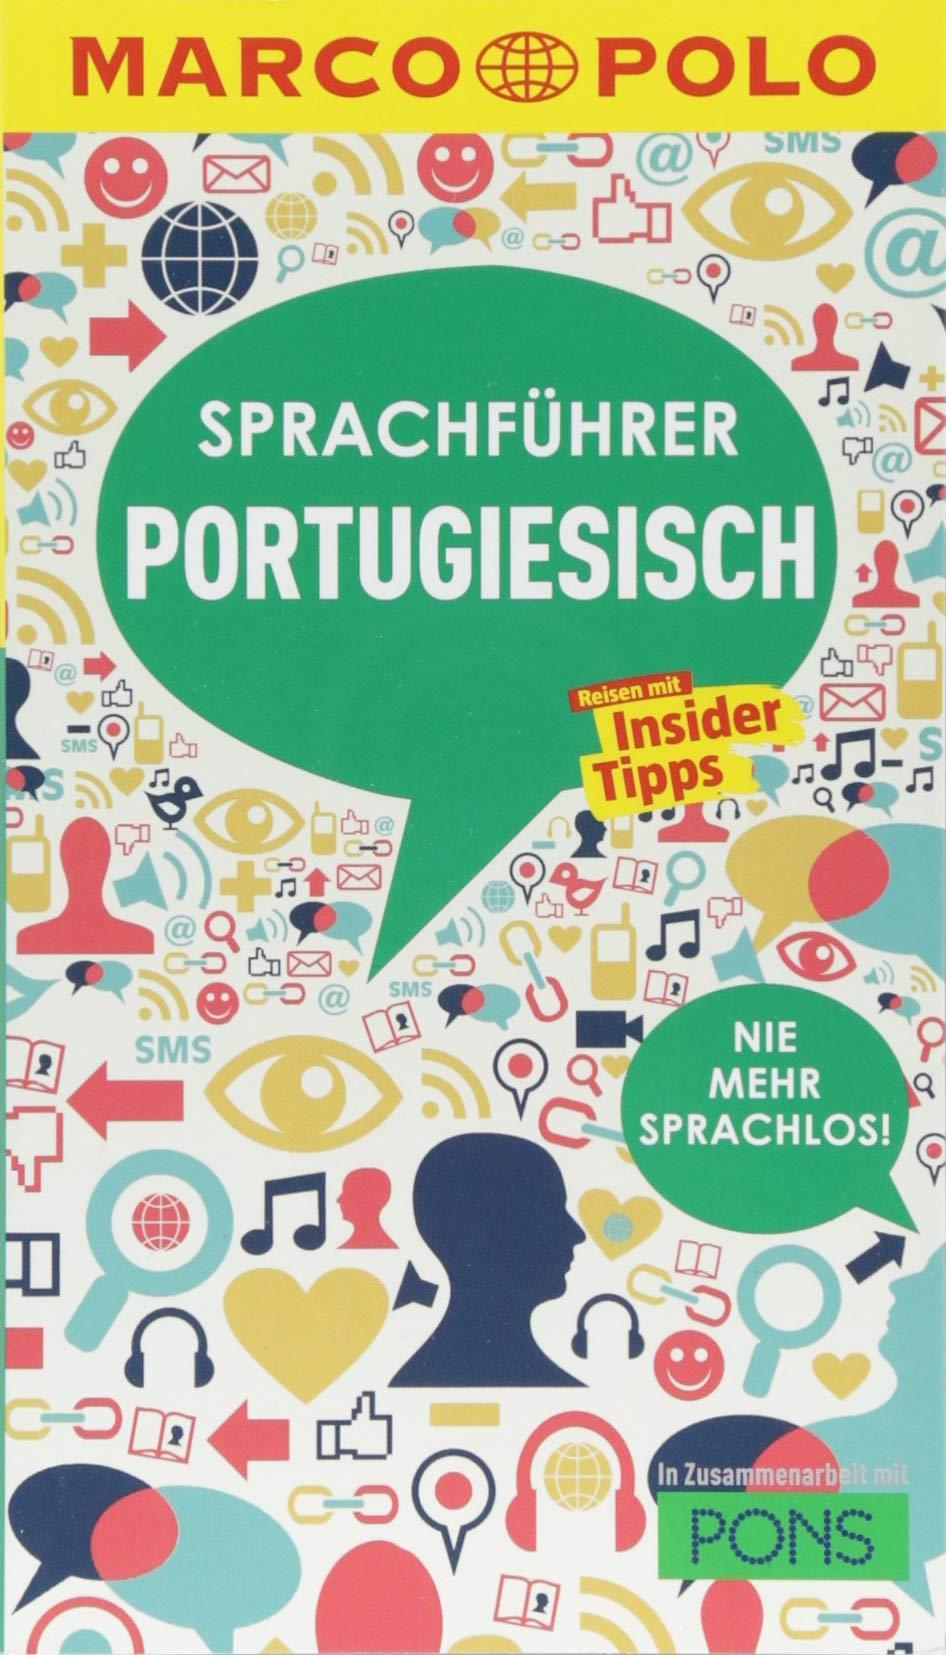 MARCO POLO Sprachführer Portugiesisch  Nie Mehr Sprachlos